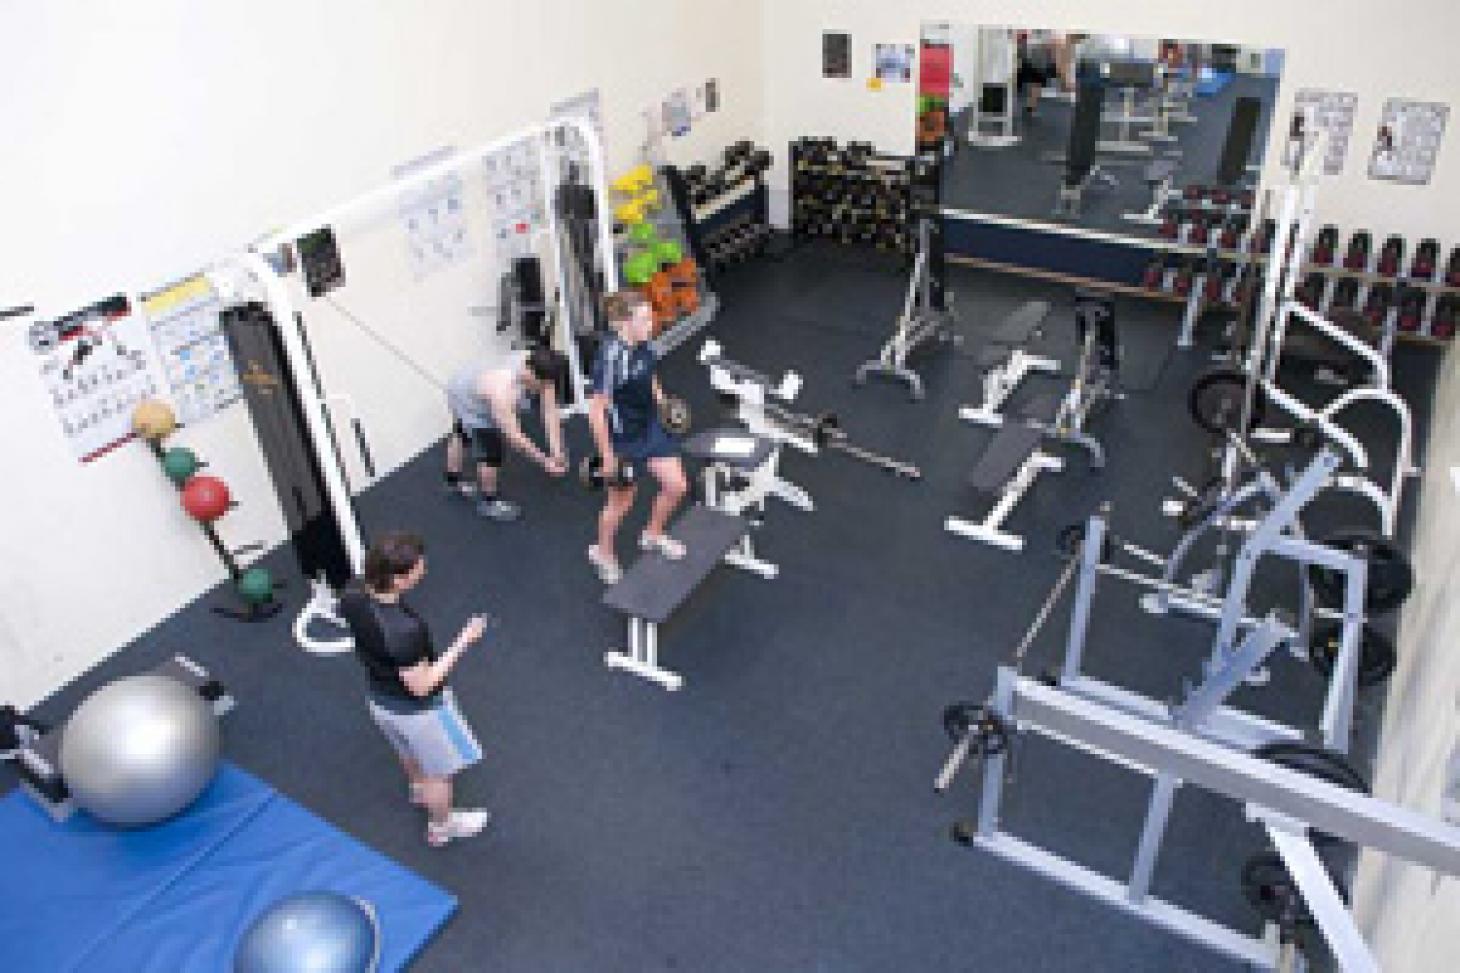 Robert Lowe Sports Centre Gym gym